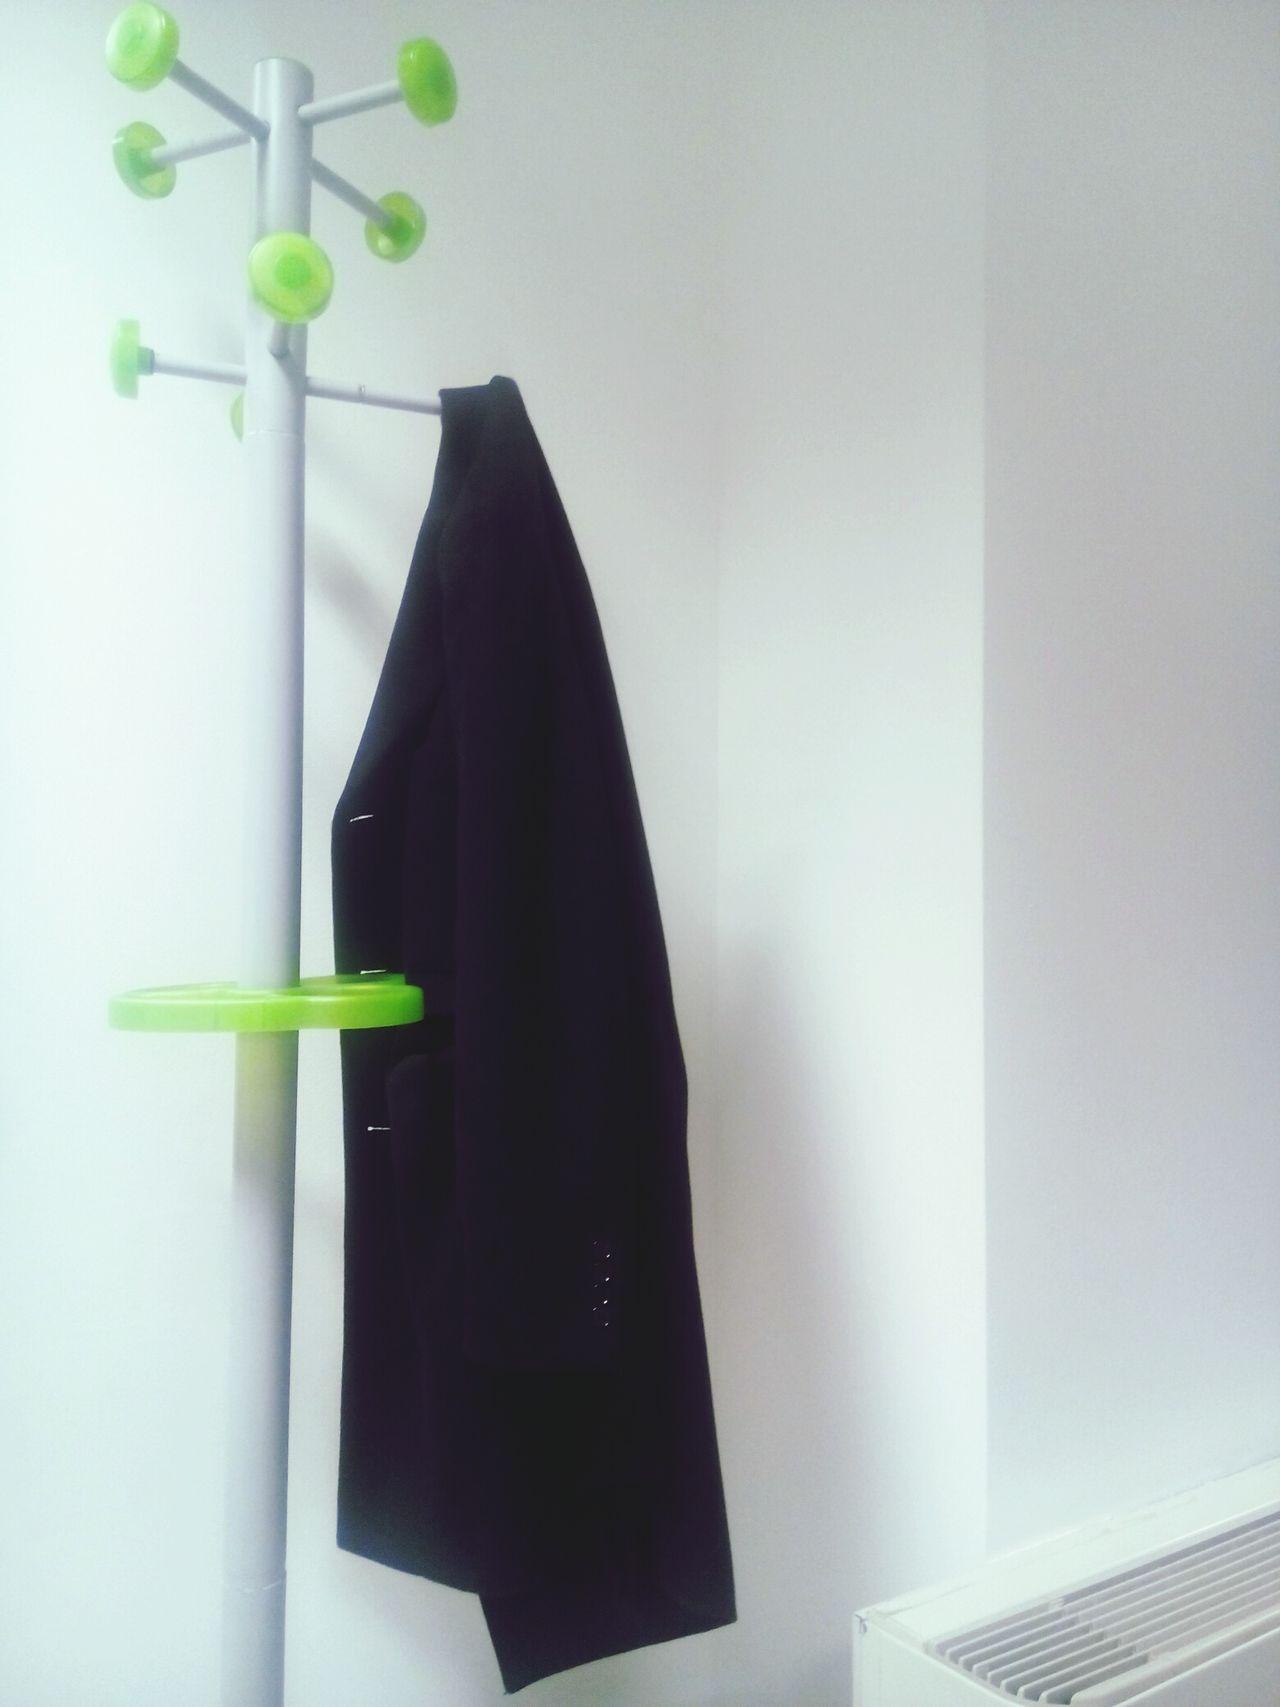 Green Color Plant Indoors  No People Black Color Day Coathanger Hanger Hanger Dress Coat Office Building Officeview